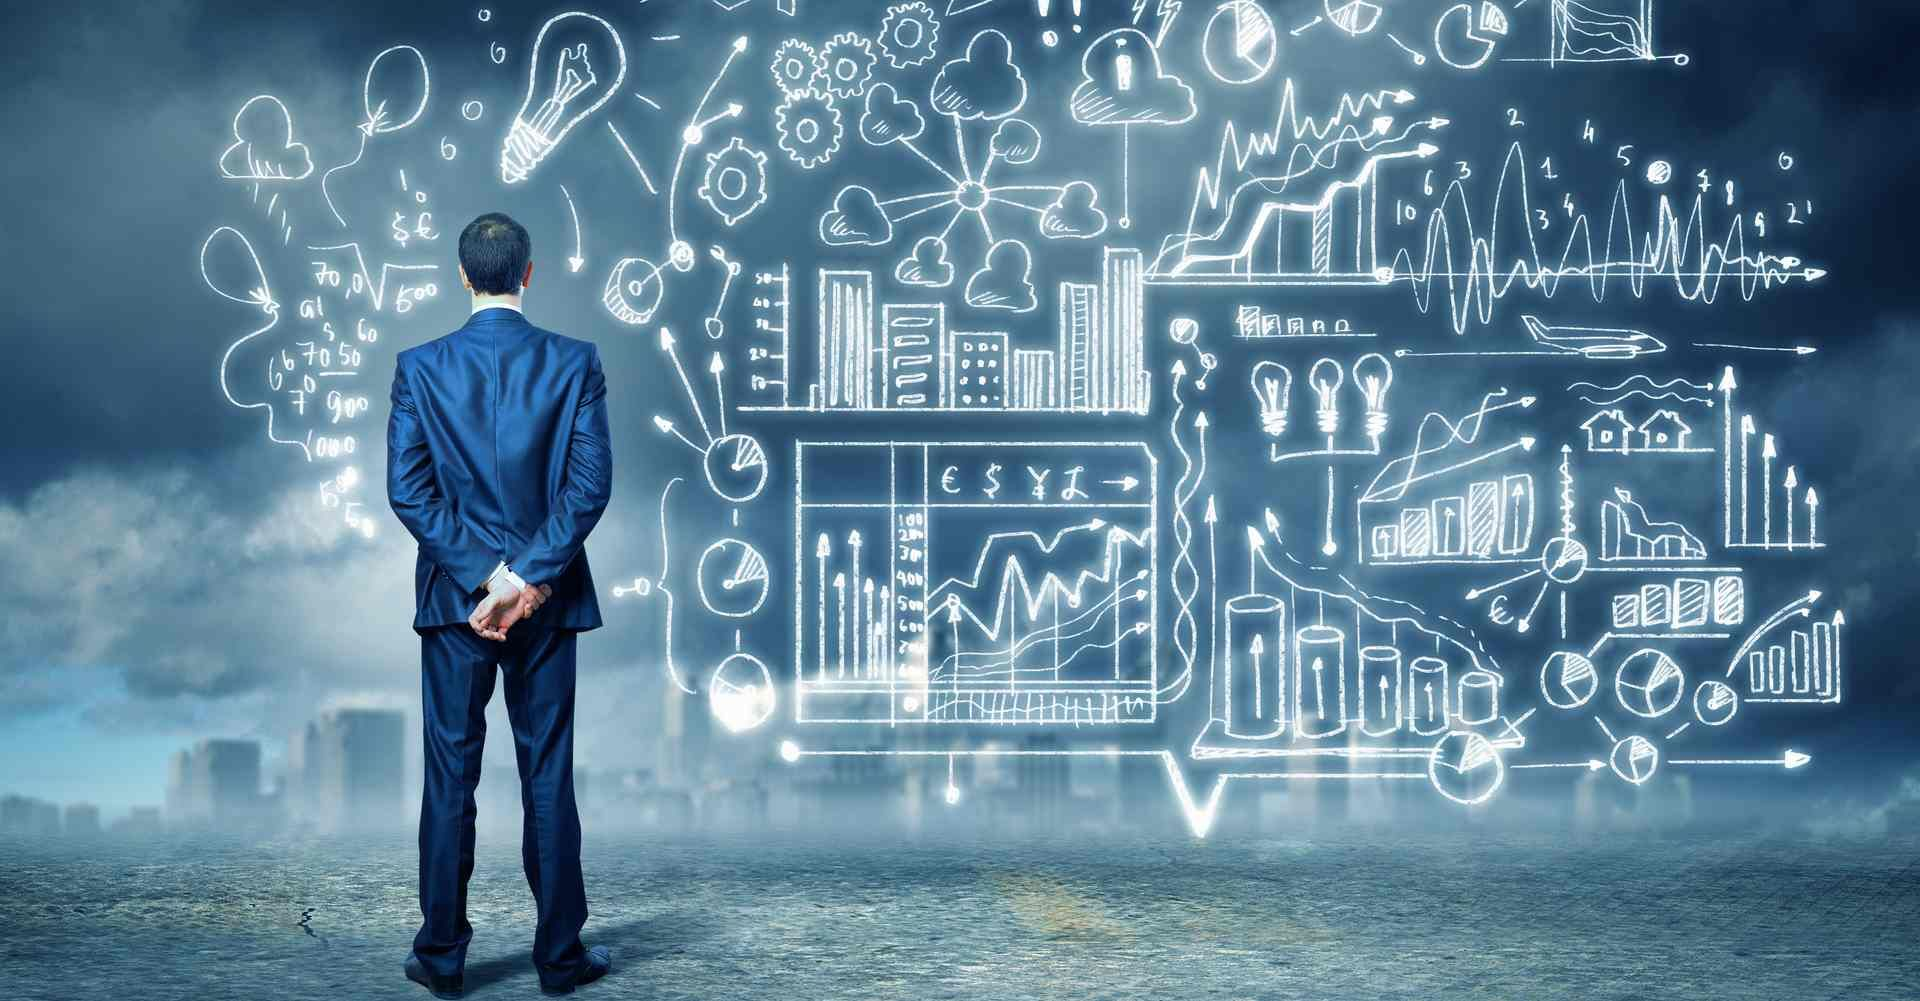 scs ingegneria dei sistemi project it manager